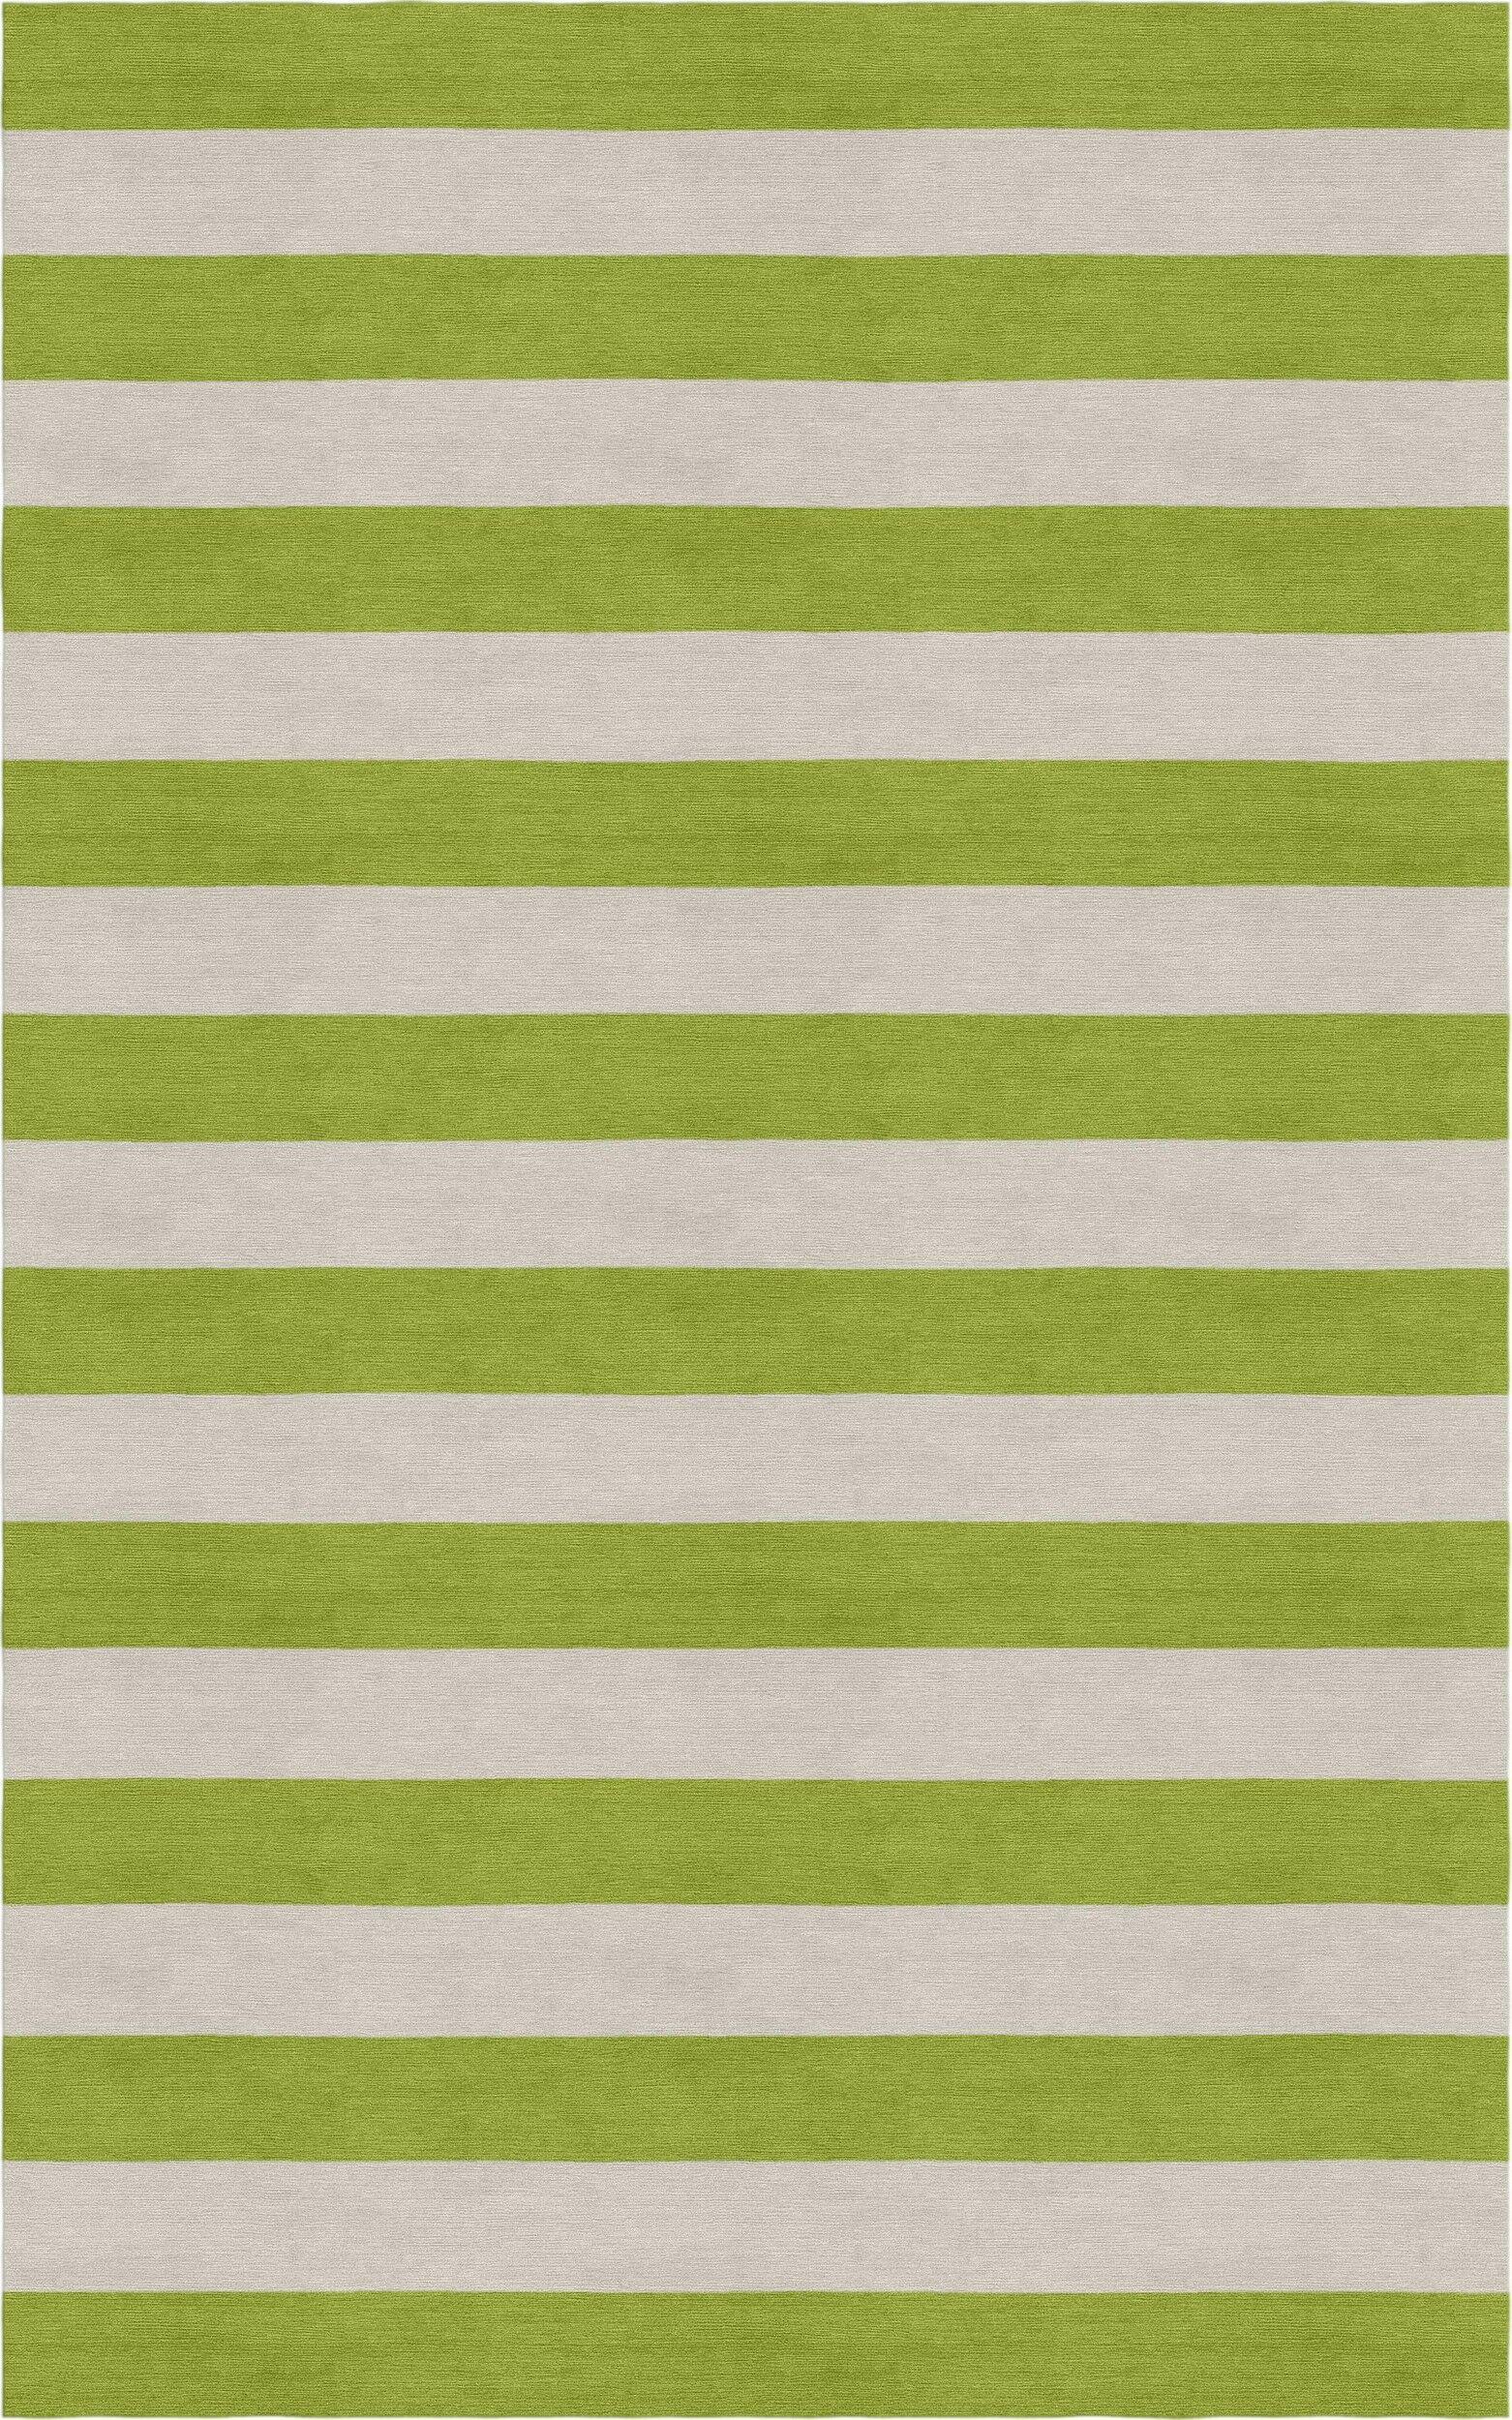 Cervantez Hand Tufted Wool Silver/Olive Green Stripe Area Rug Rug Size: Rectangle 6' x 9'